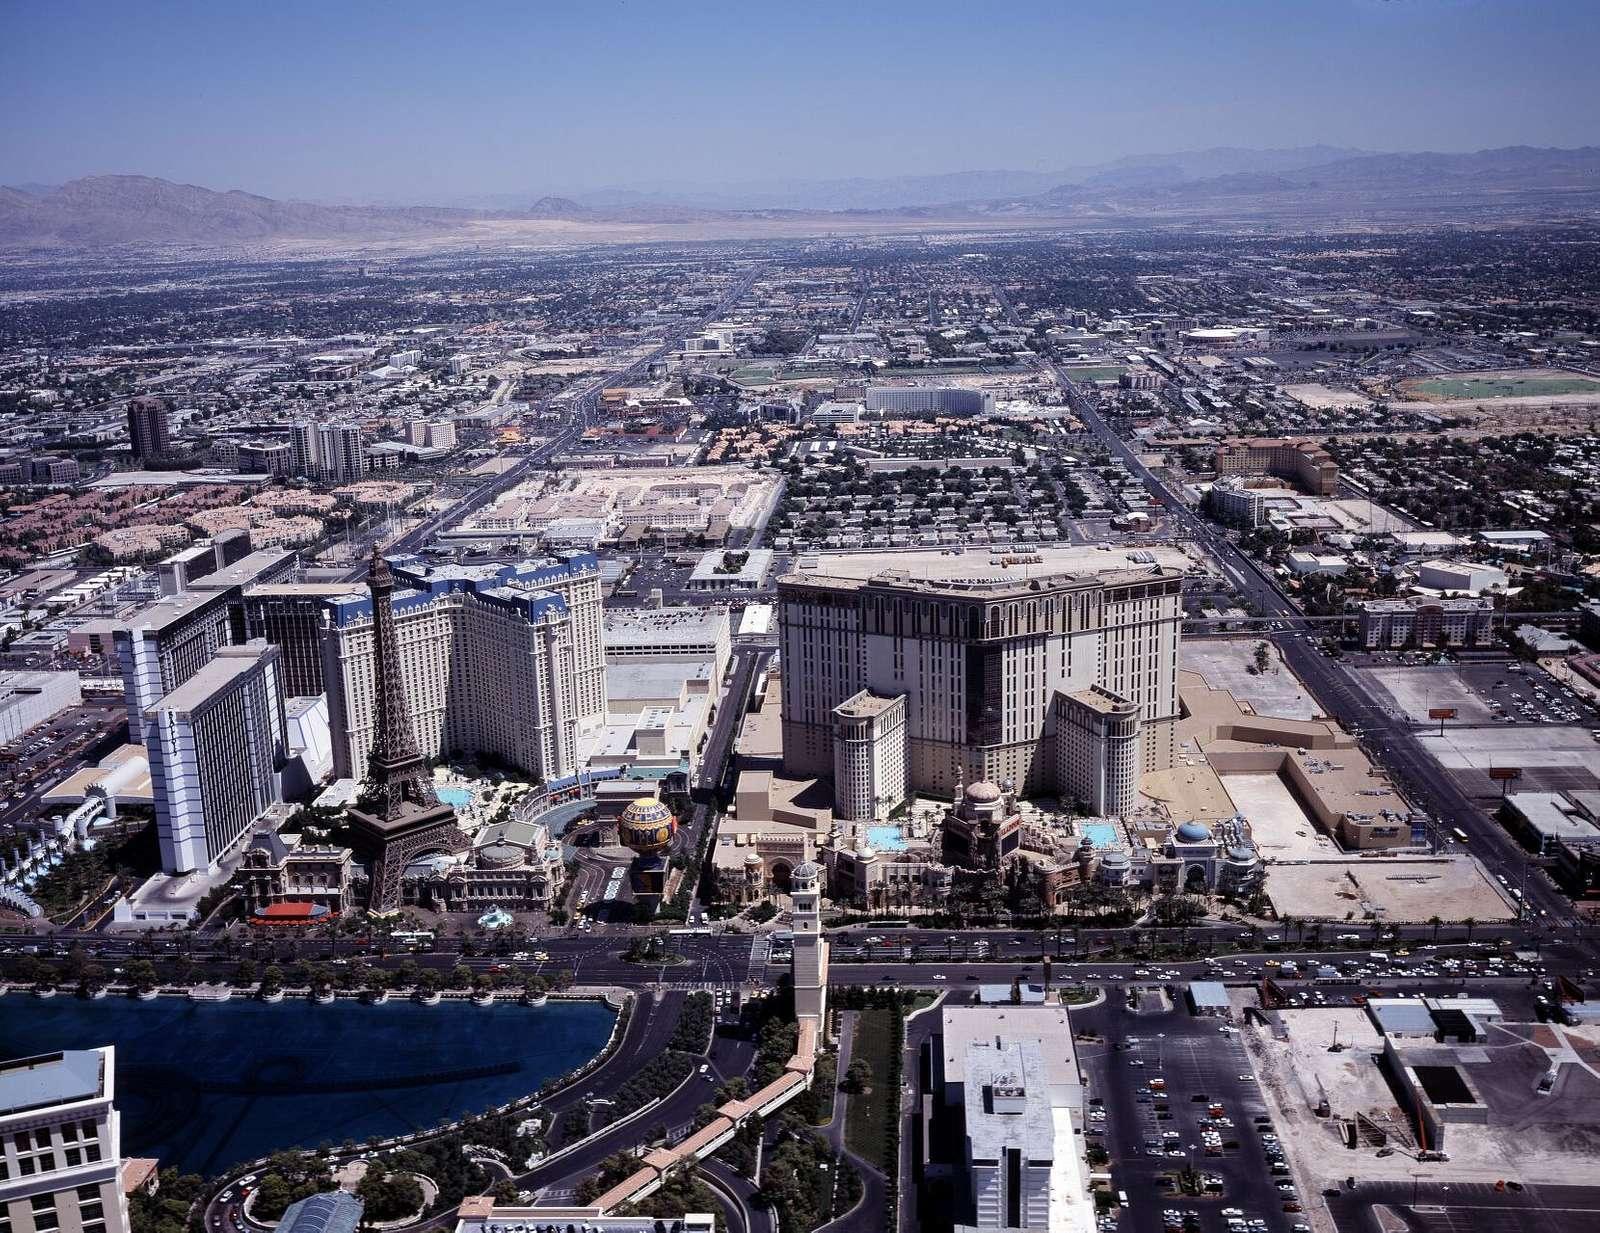 Aerial view of Las Vegas, Nevada, with a focus on Las Vegas Strip casinos, including the Paris Las Vegas's half-scale replica of the Eiffel Tower